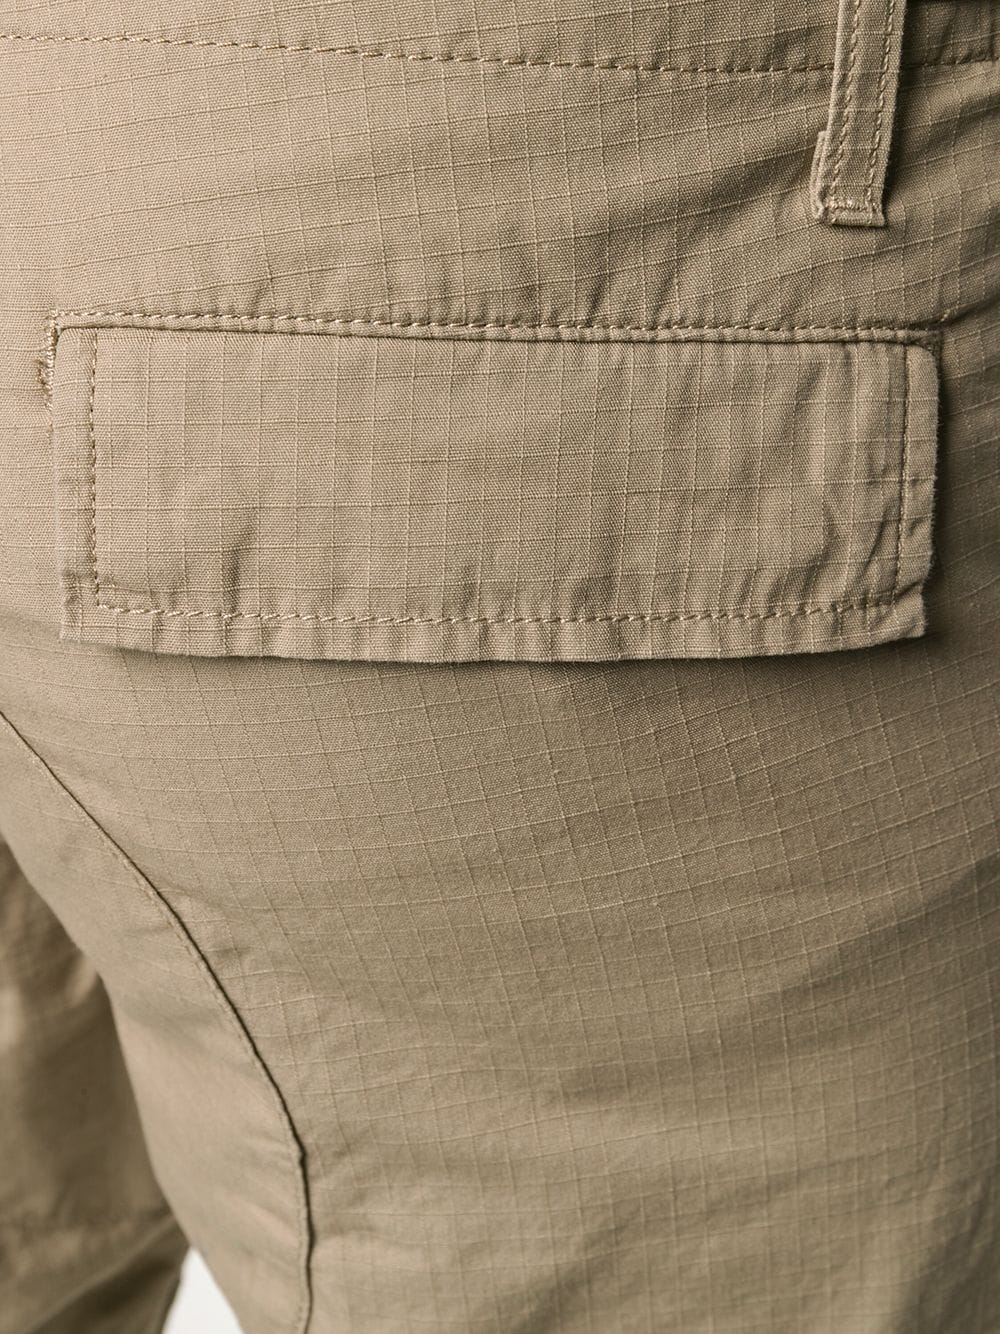 pantaloni cargo uomo beige in cotone CARHARTT WIP | Pantaloni | I0095788Y.02